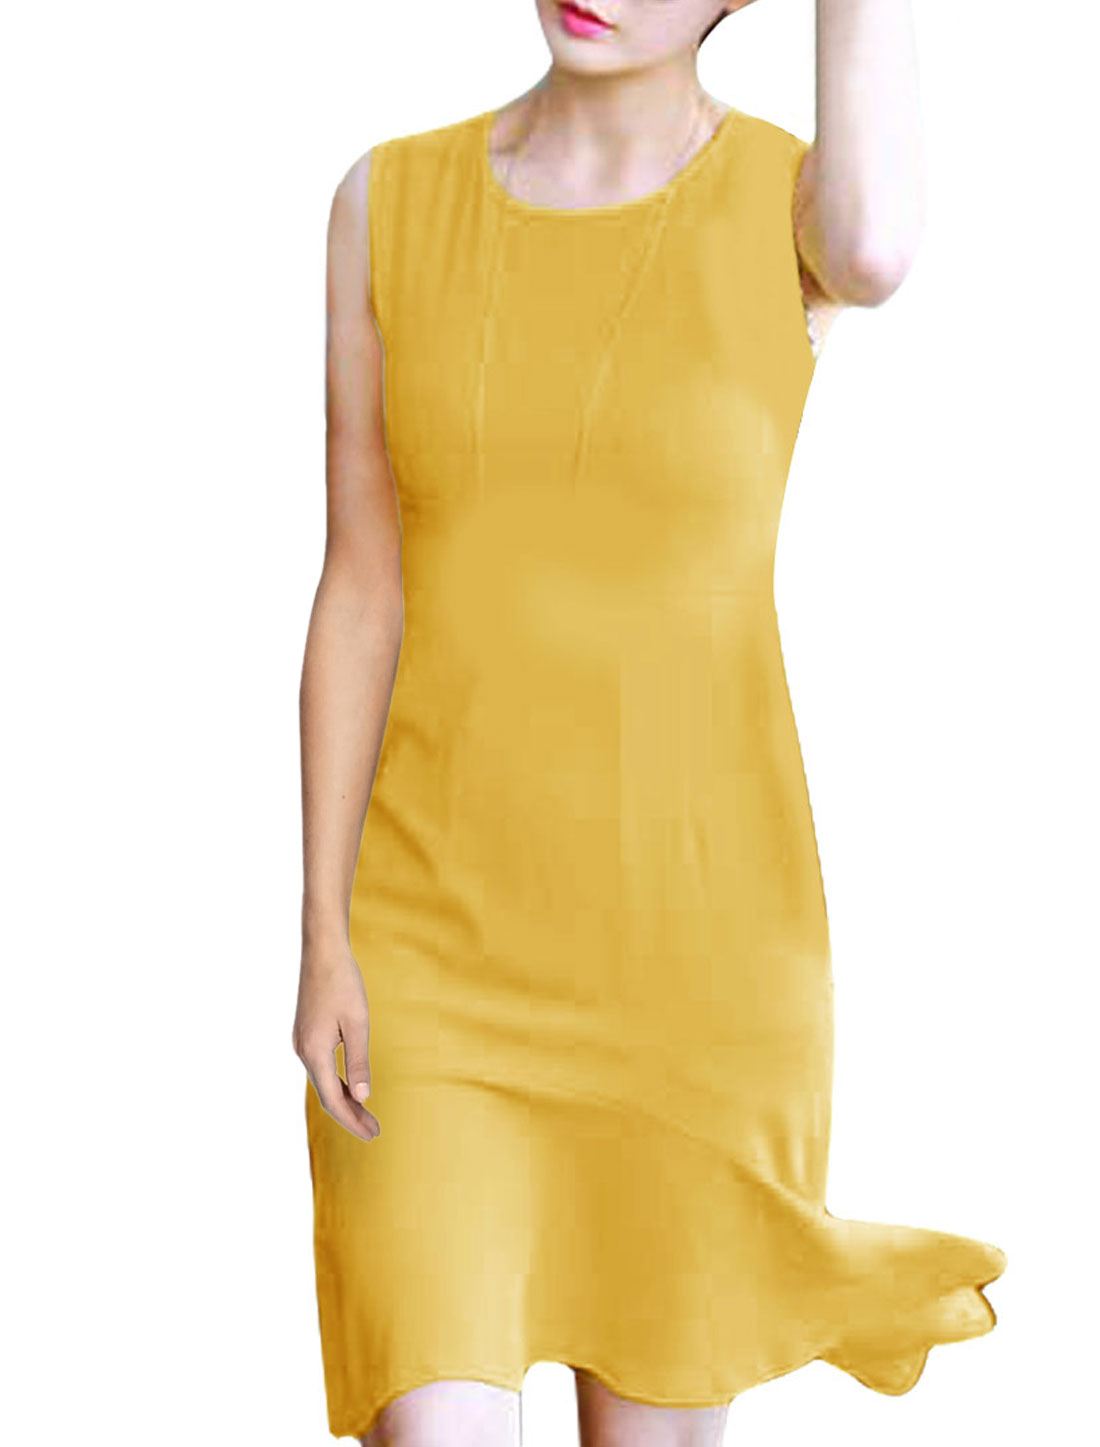 Women Pullover Sleeveless Round Neck Style High Low Hem Dress Yellow XS